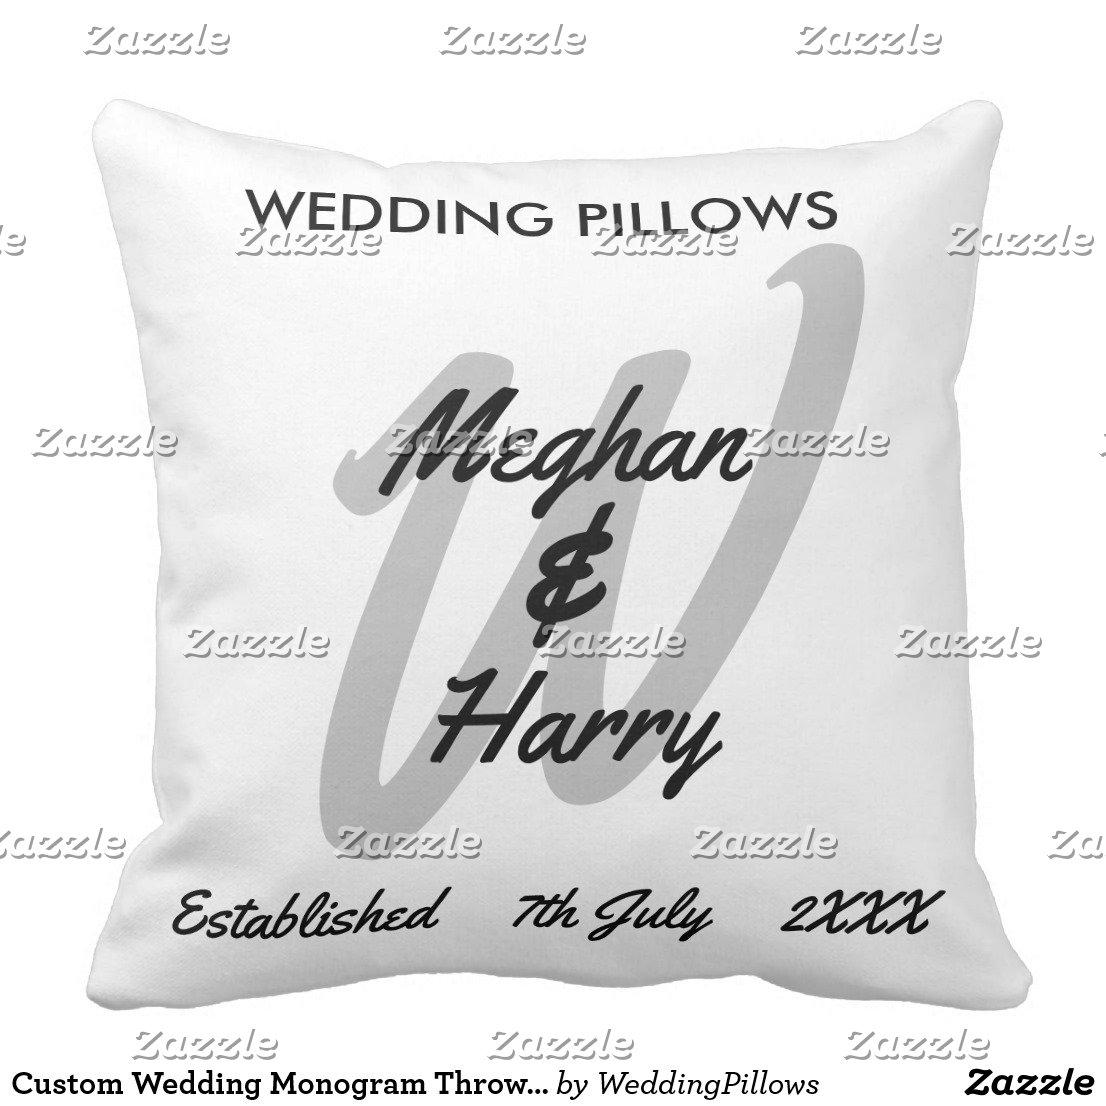 Bride & Groom Monogram Throw Pillows